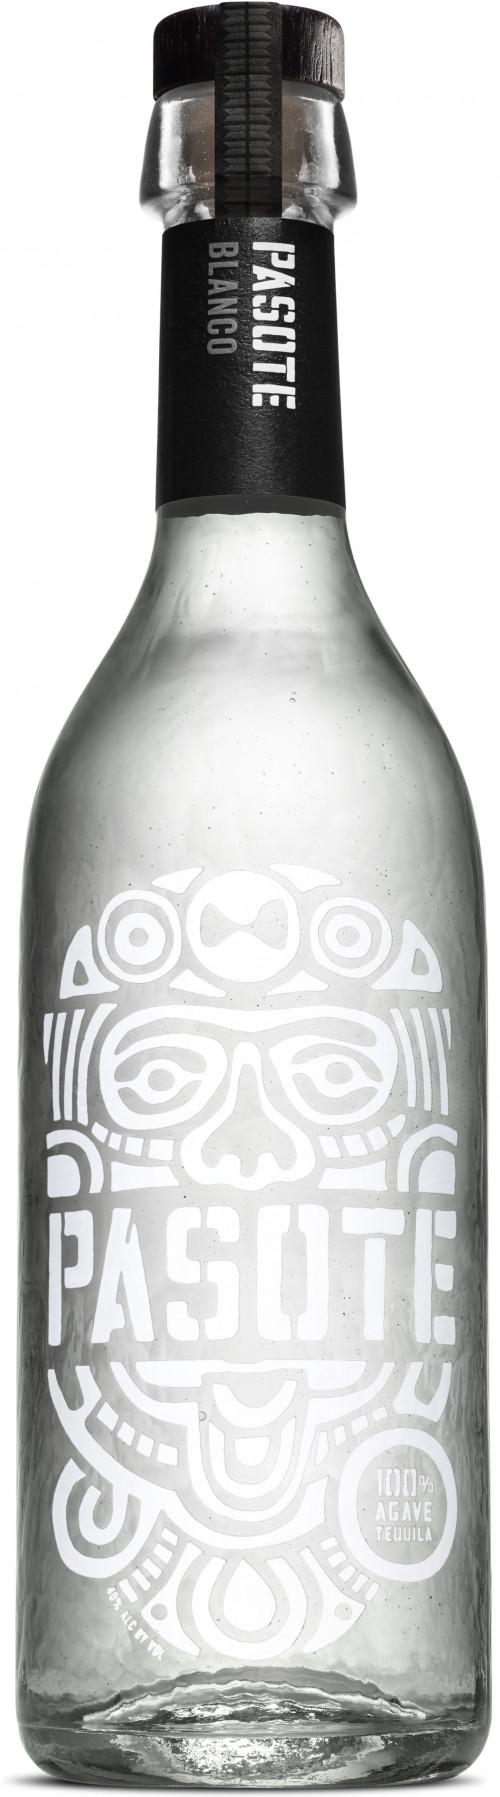 Pasote Blanco Tequila 750ml